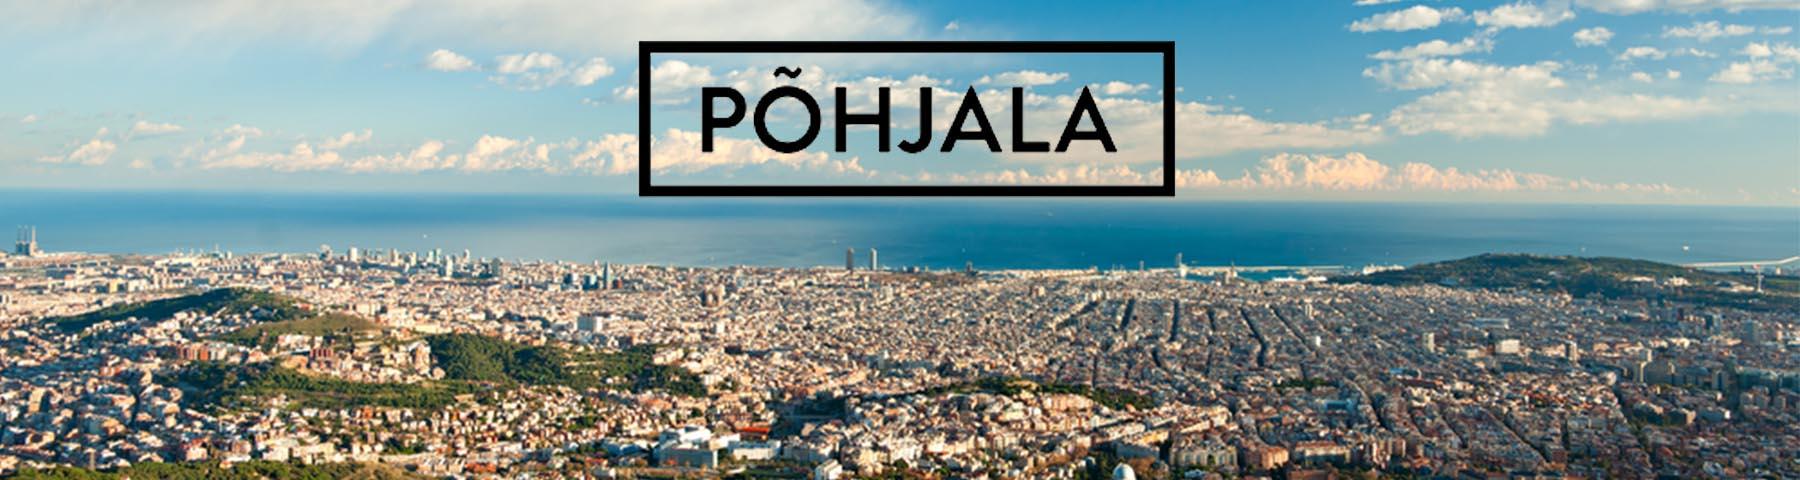 Pohjala en Barcelona